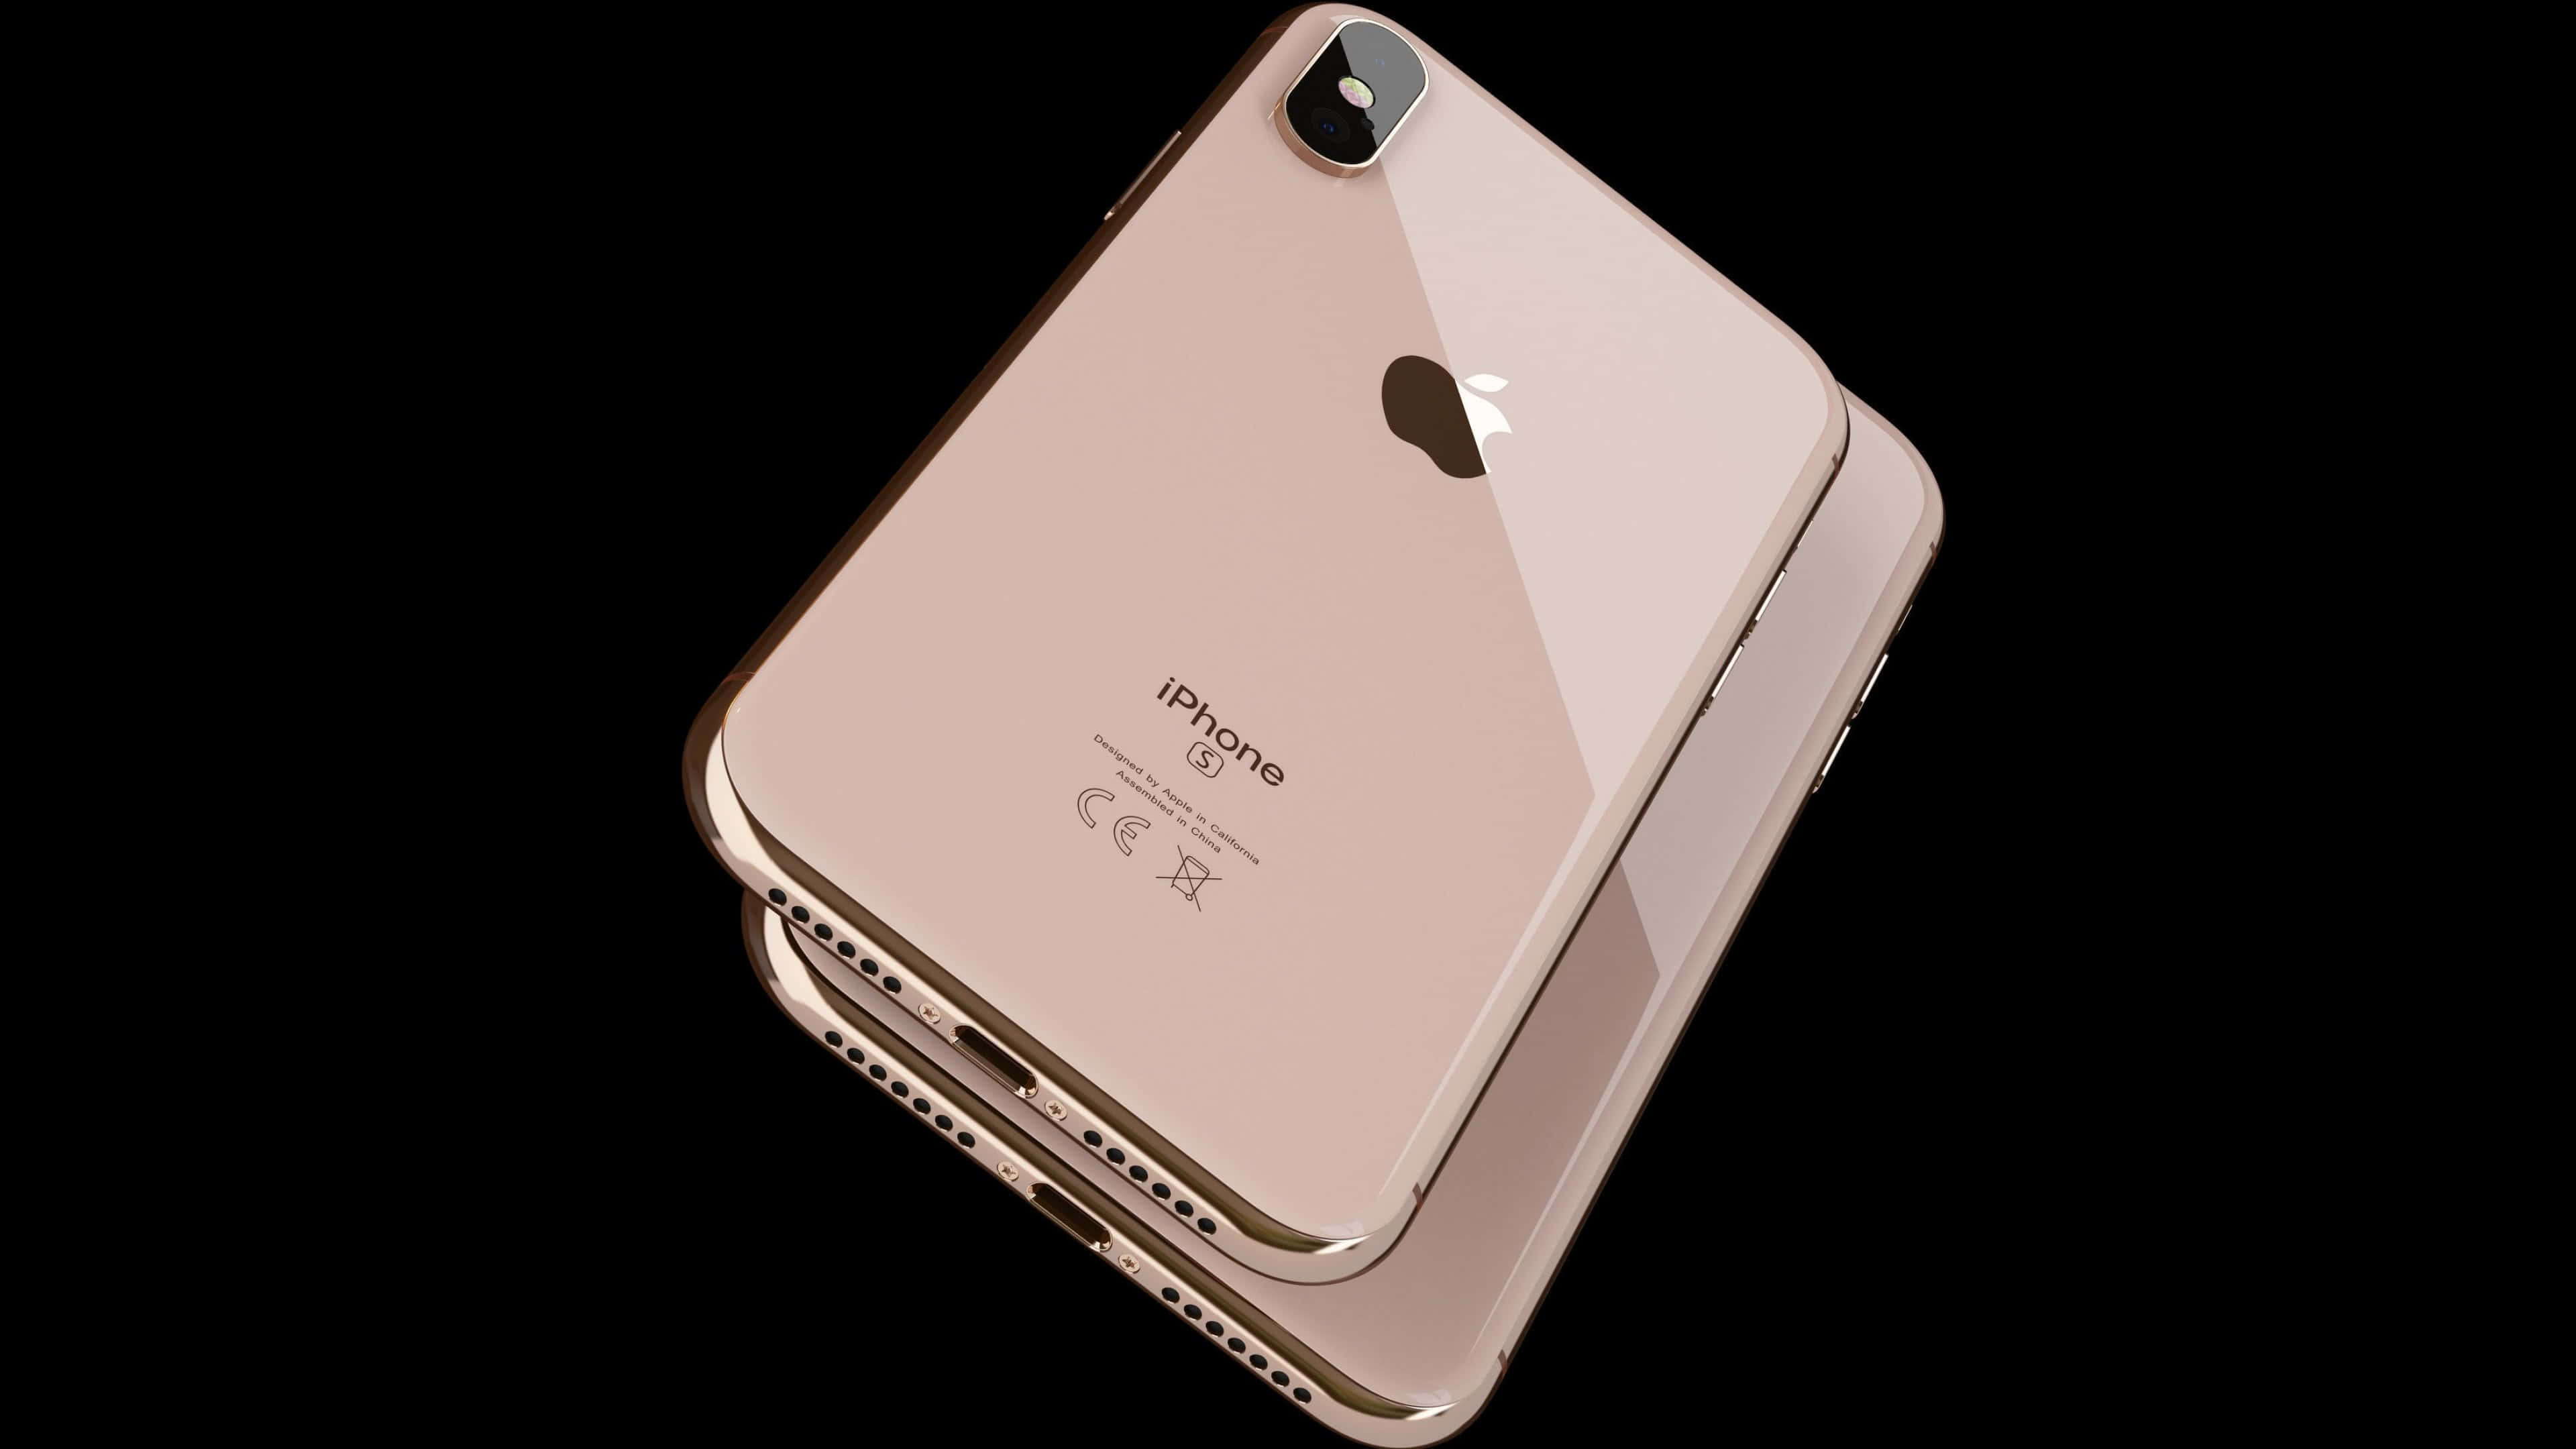 Apple Iphone Xs Max Gold Uhd 4k Wallpaper Pixelz Cc